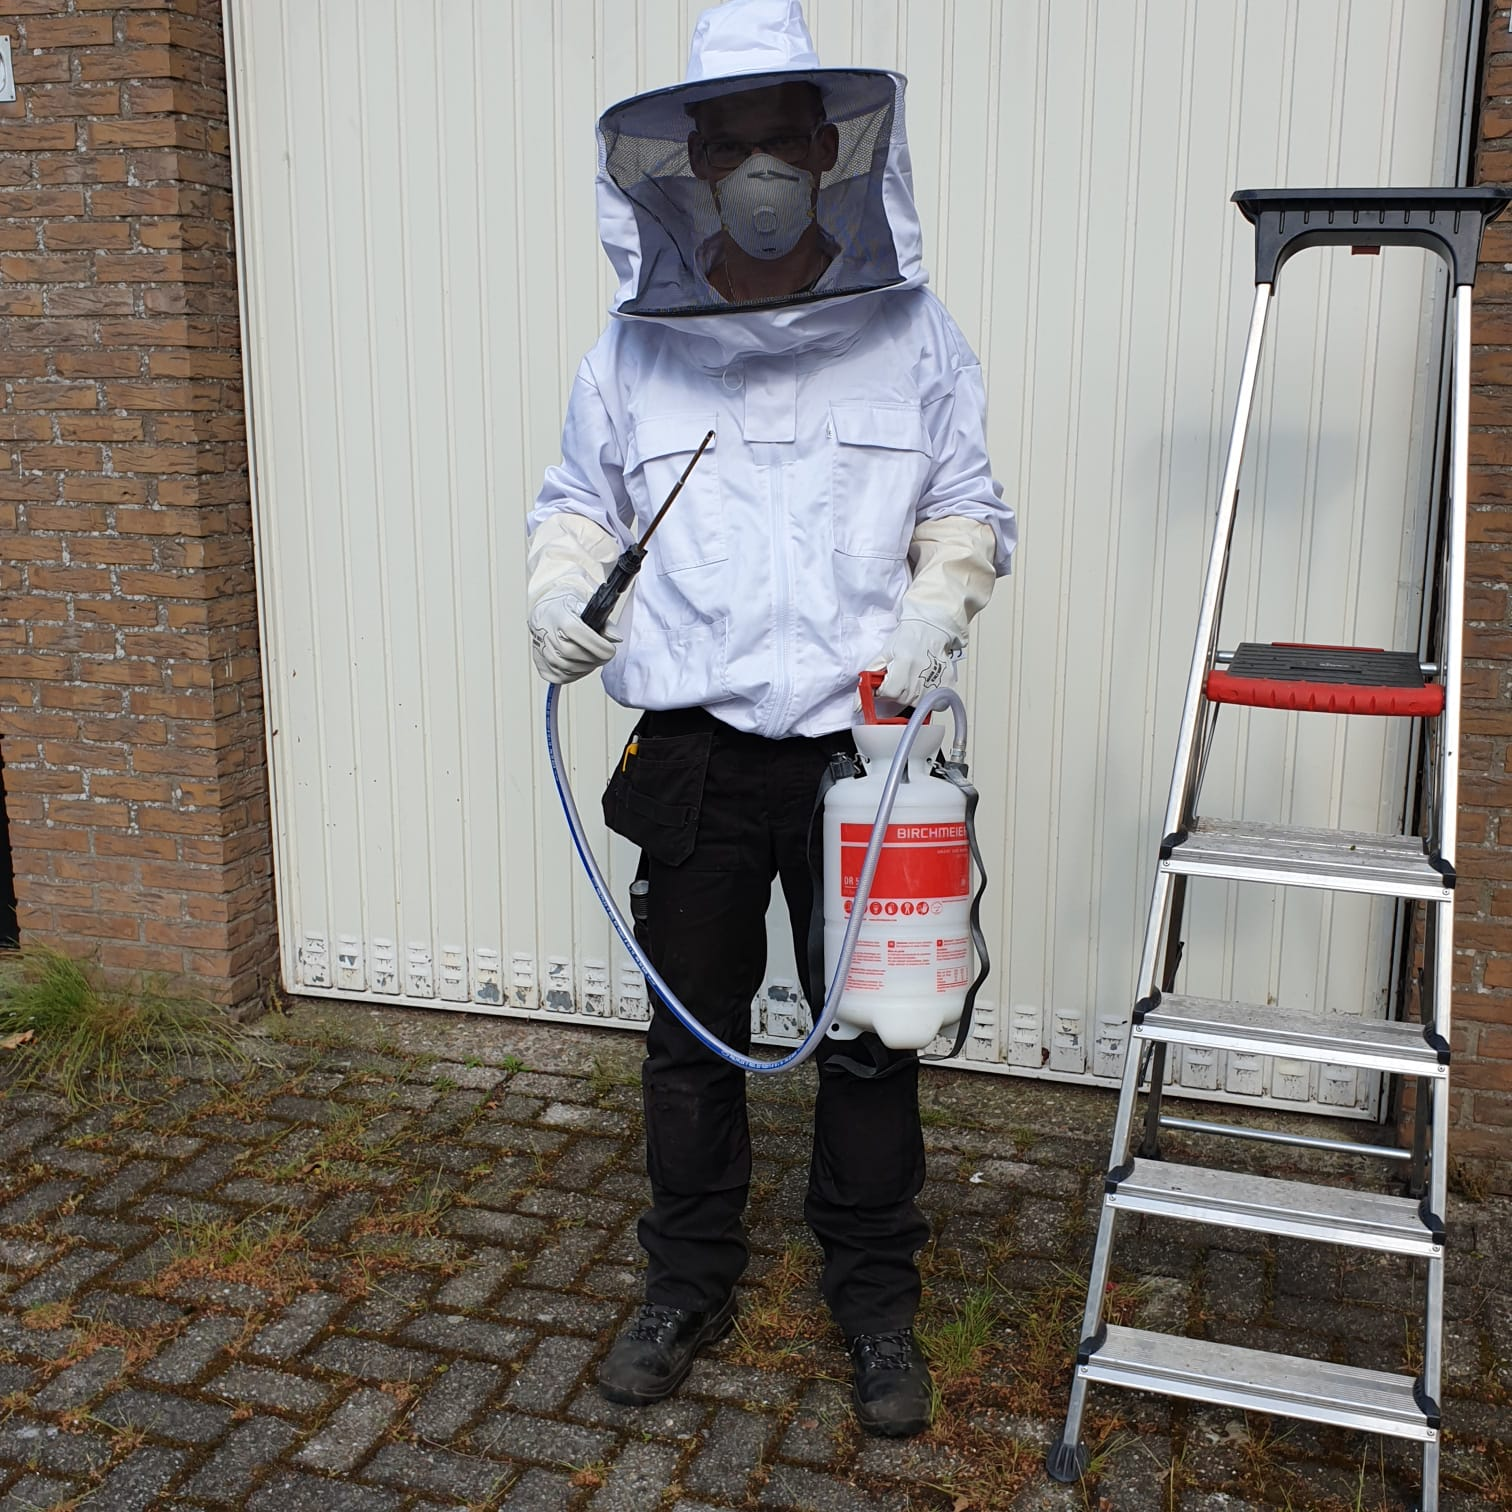 Wespen bestrijder in beschermende kleding